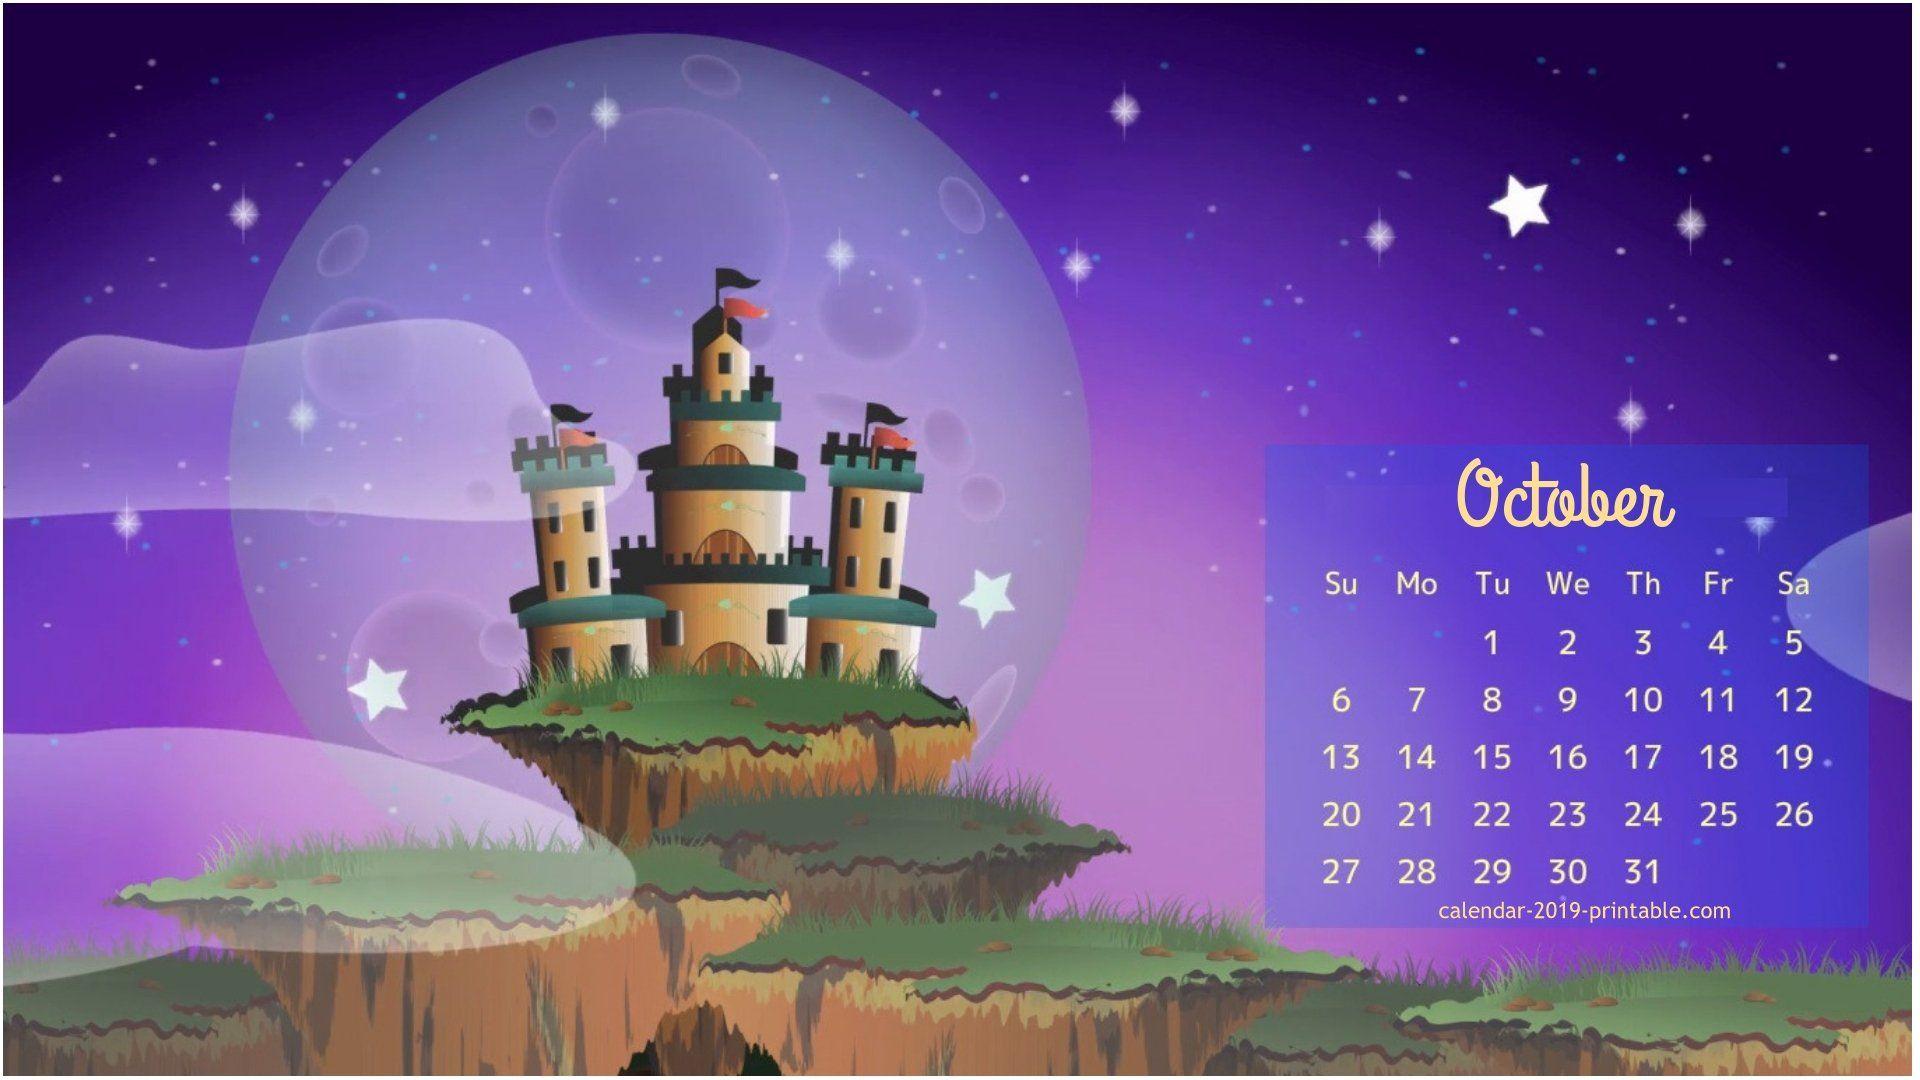 calendar wallpaper for october 2019 Calendar wallpaper